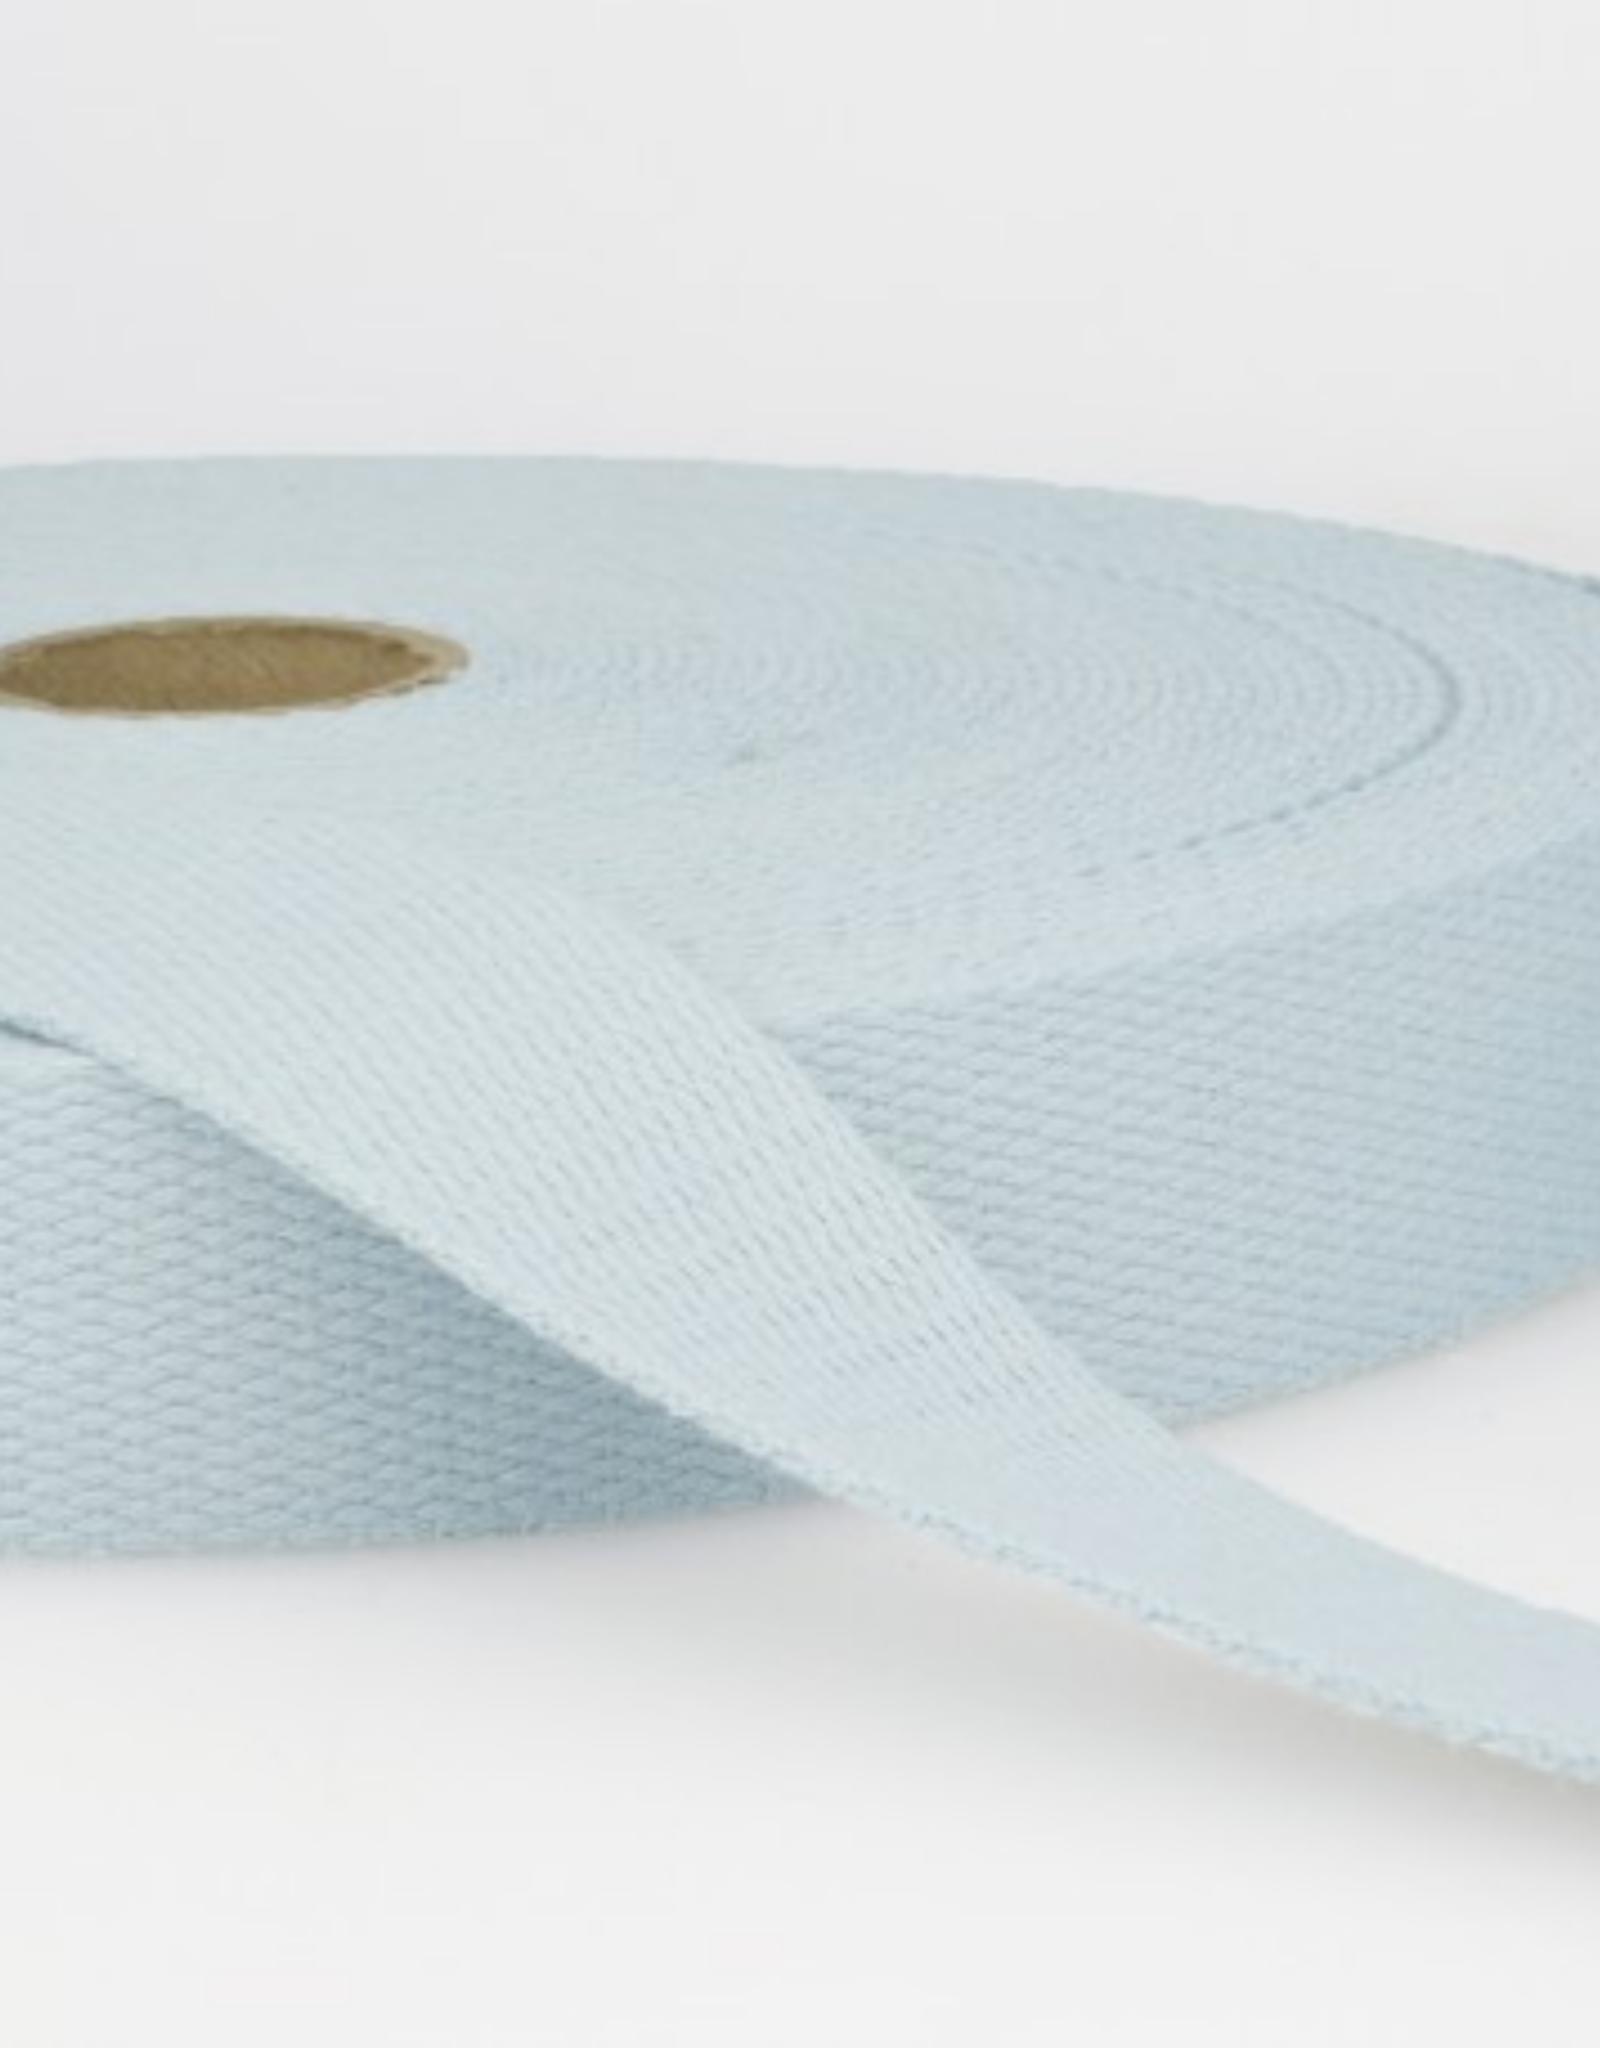 Tassenband - Zachtblauw - 30mm